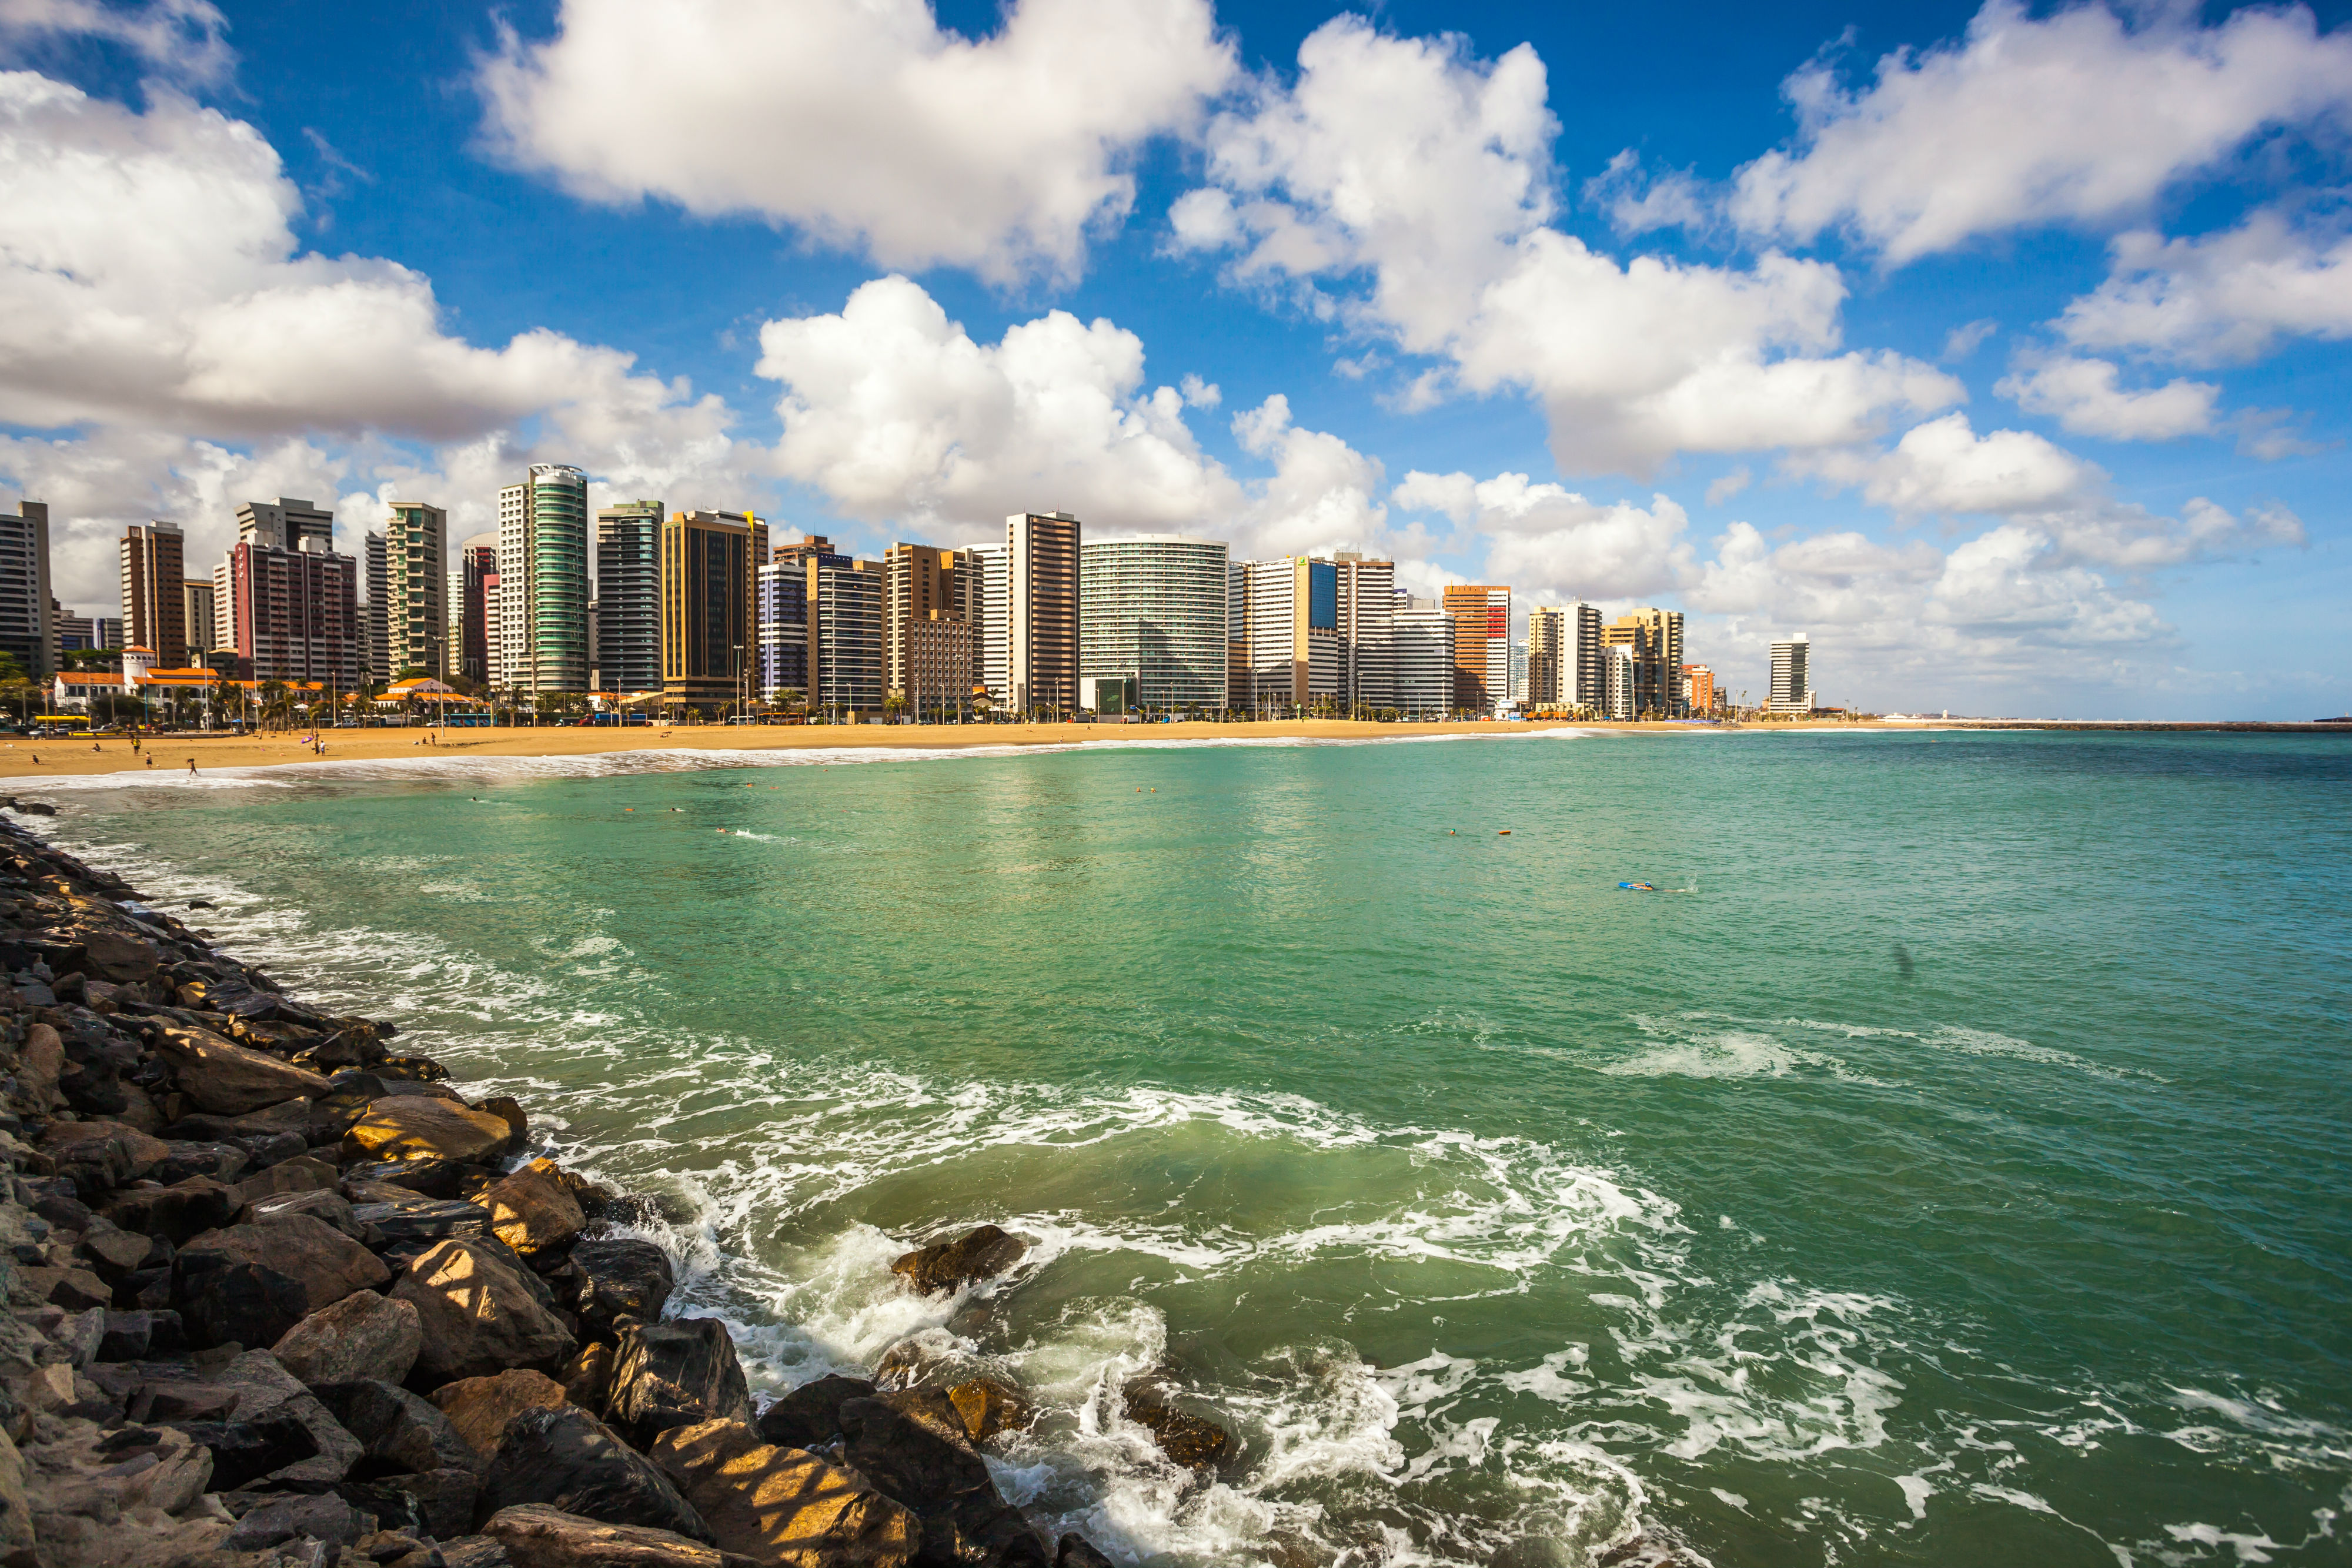 https://upload.wikimedia.org/wikipedia/commons/b/bd/Seashore_of_Fortaleza_(3).jpg